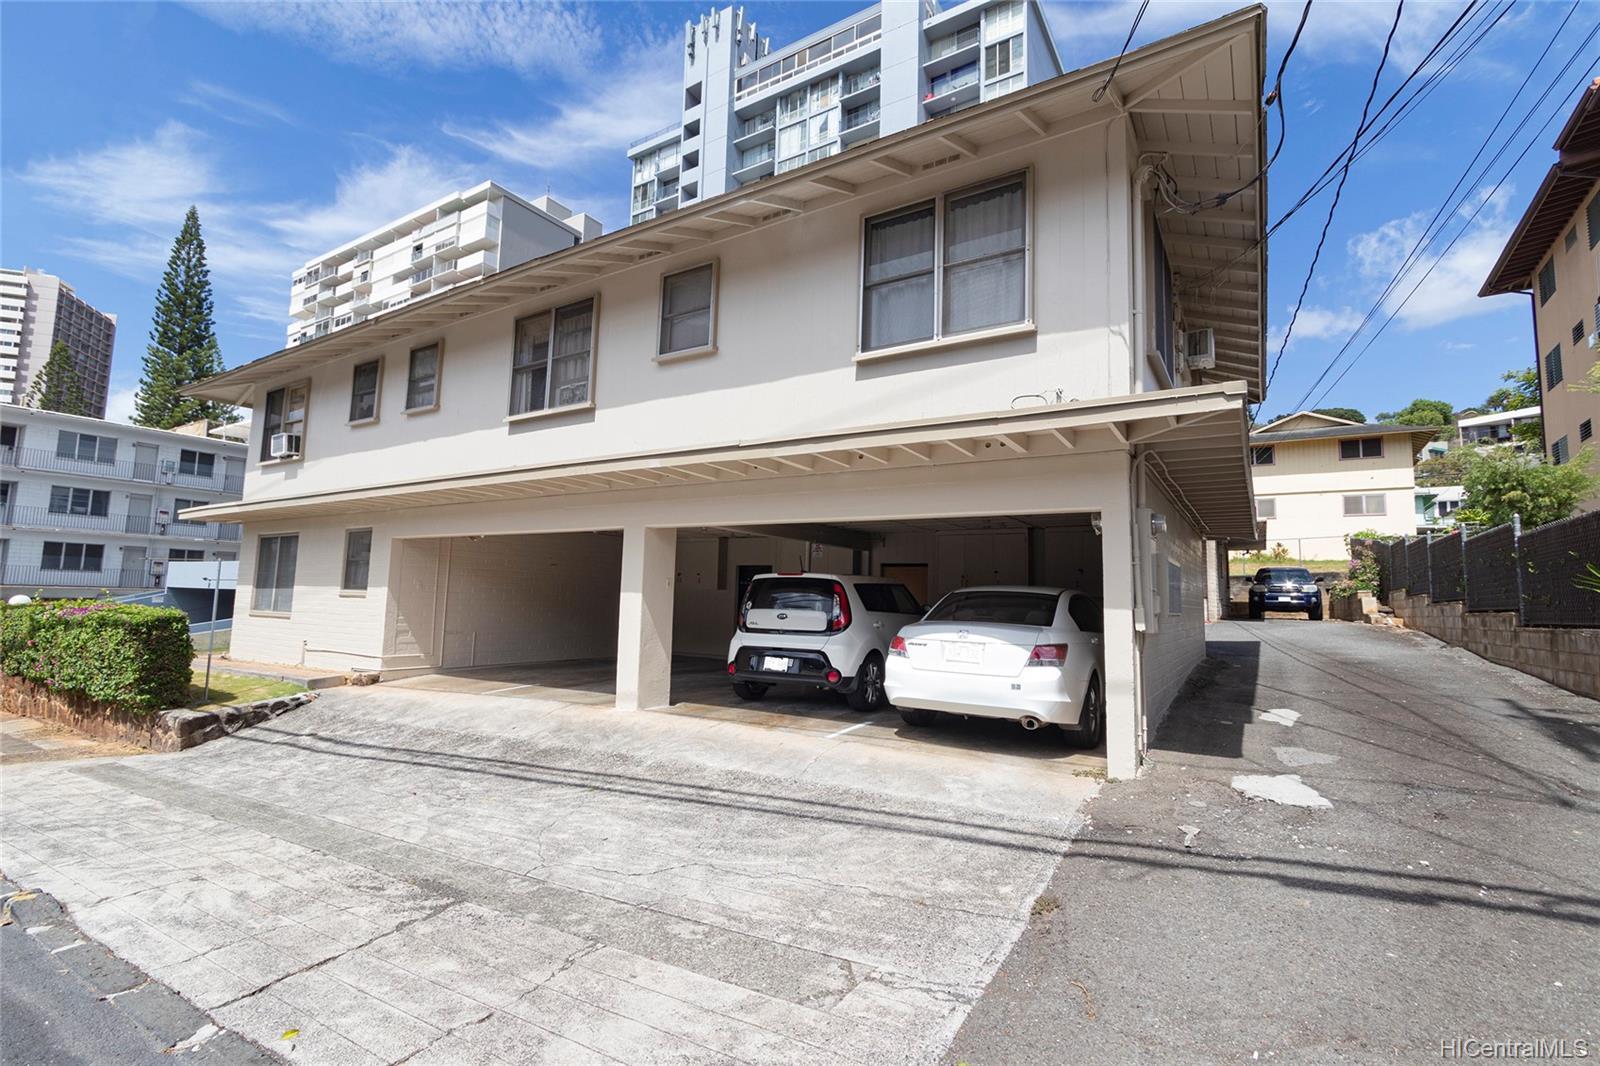 1464 Thurston Ave Honolulu - Multi-family - photo 1 of 25